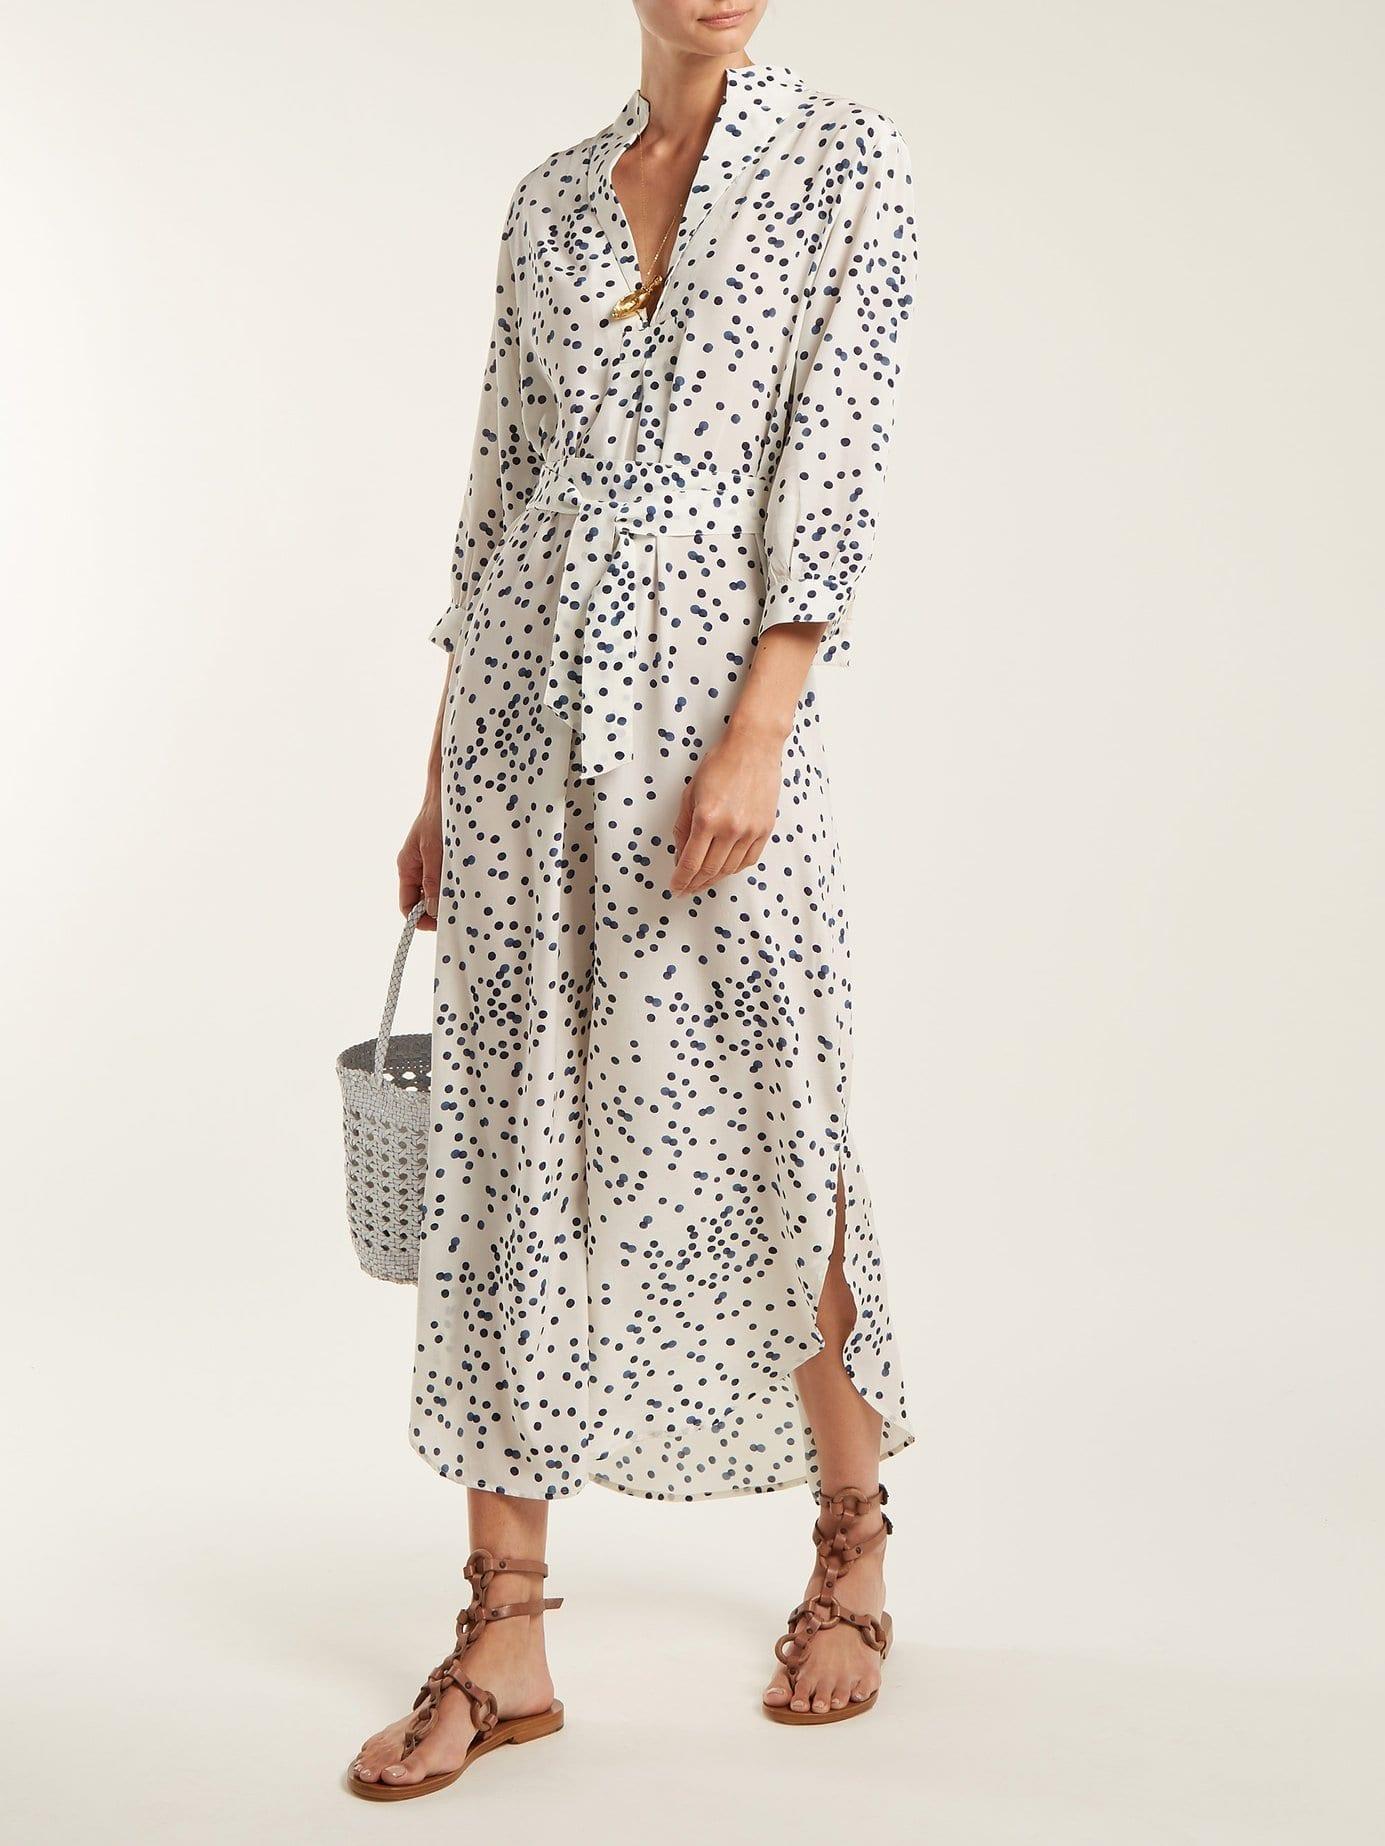 WIGGY KIT St Germain Silk White Dress